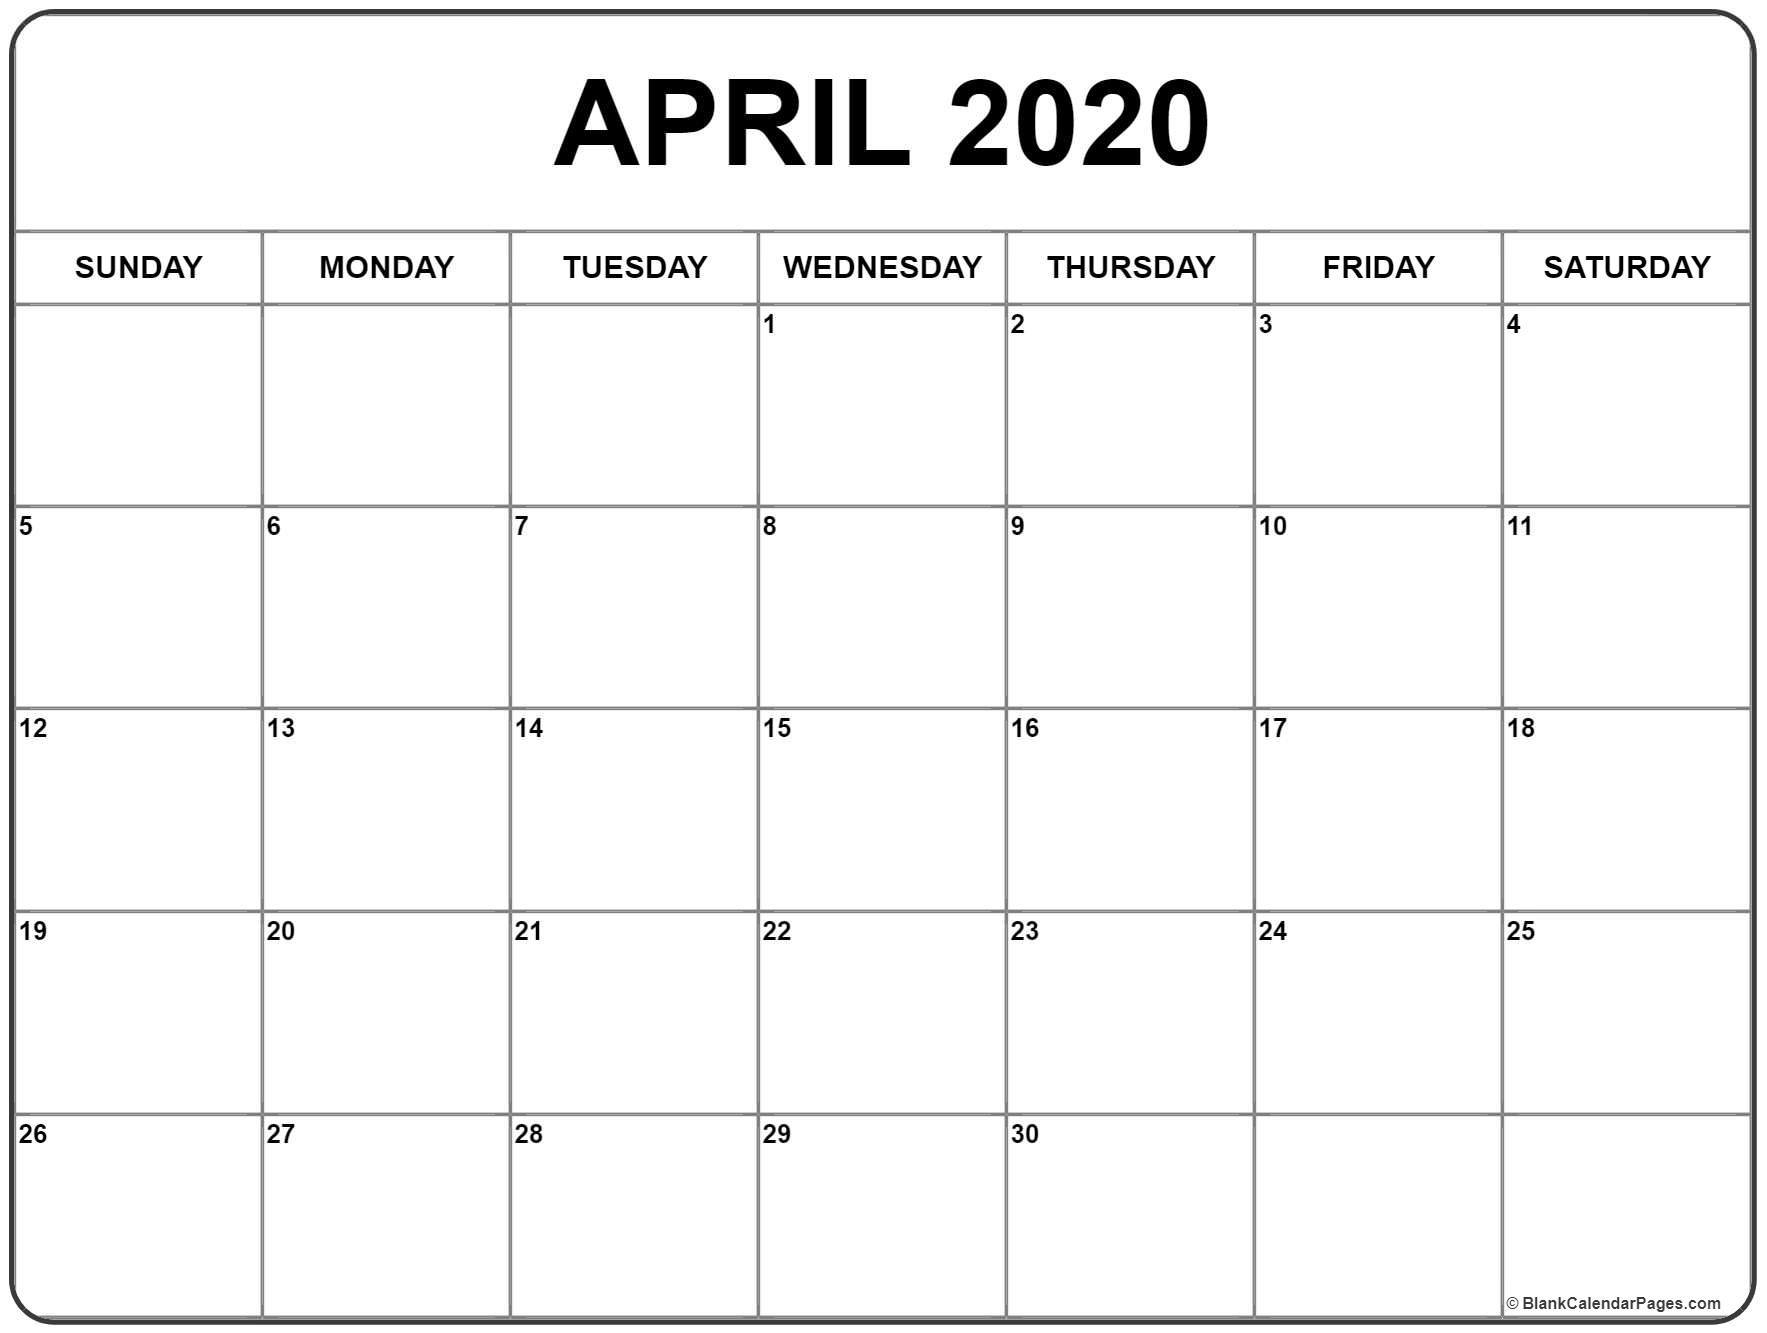 April 2020 Calendar | Free Printable Monthly Calendars  Full Page Blank Calendar